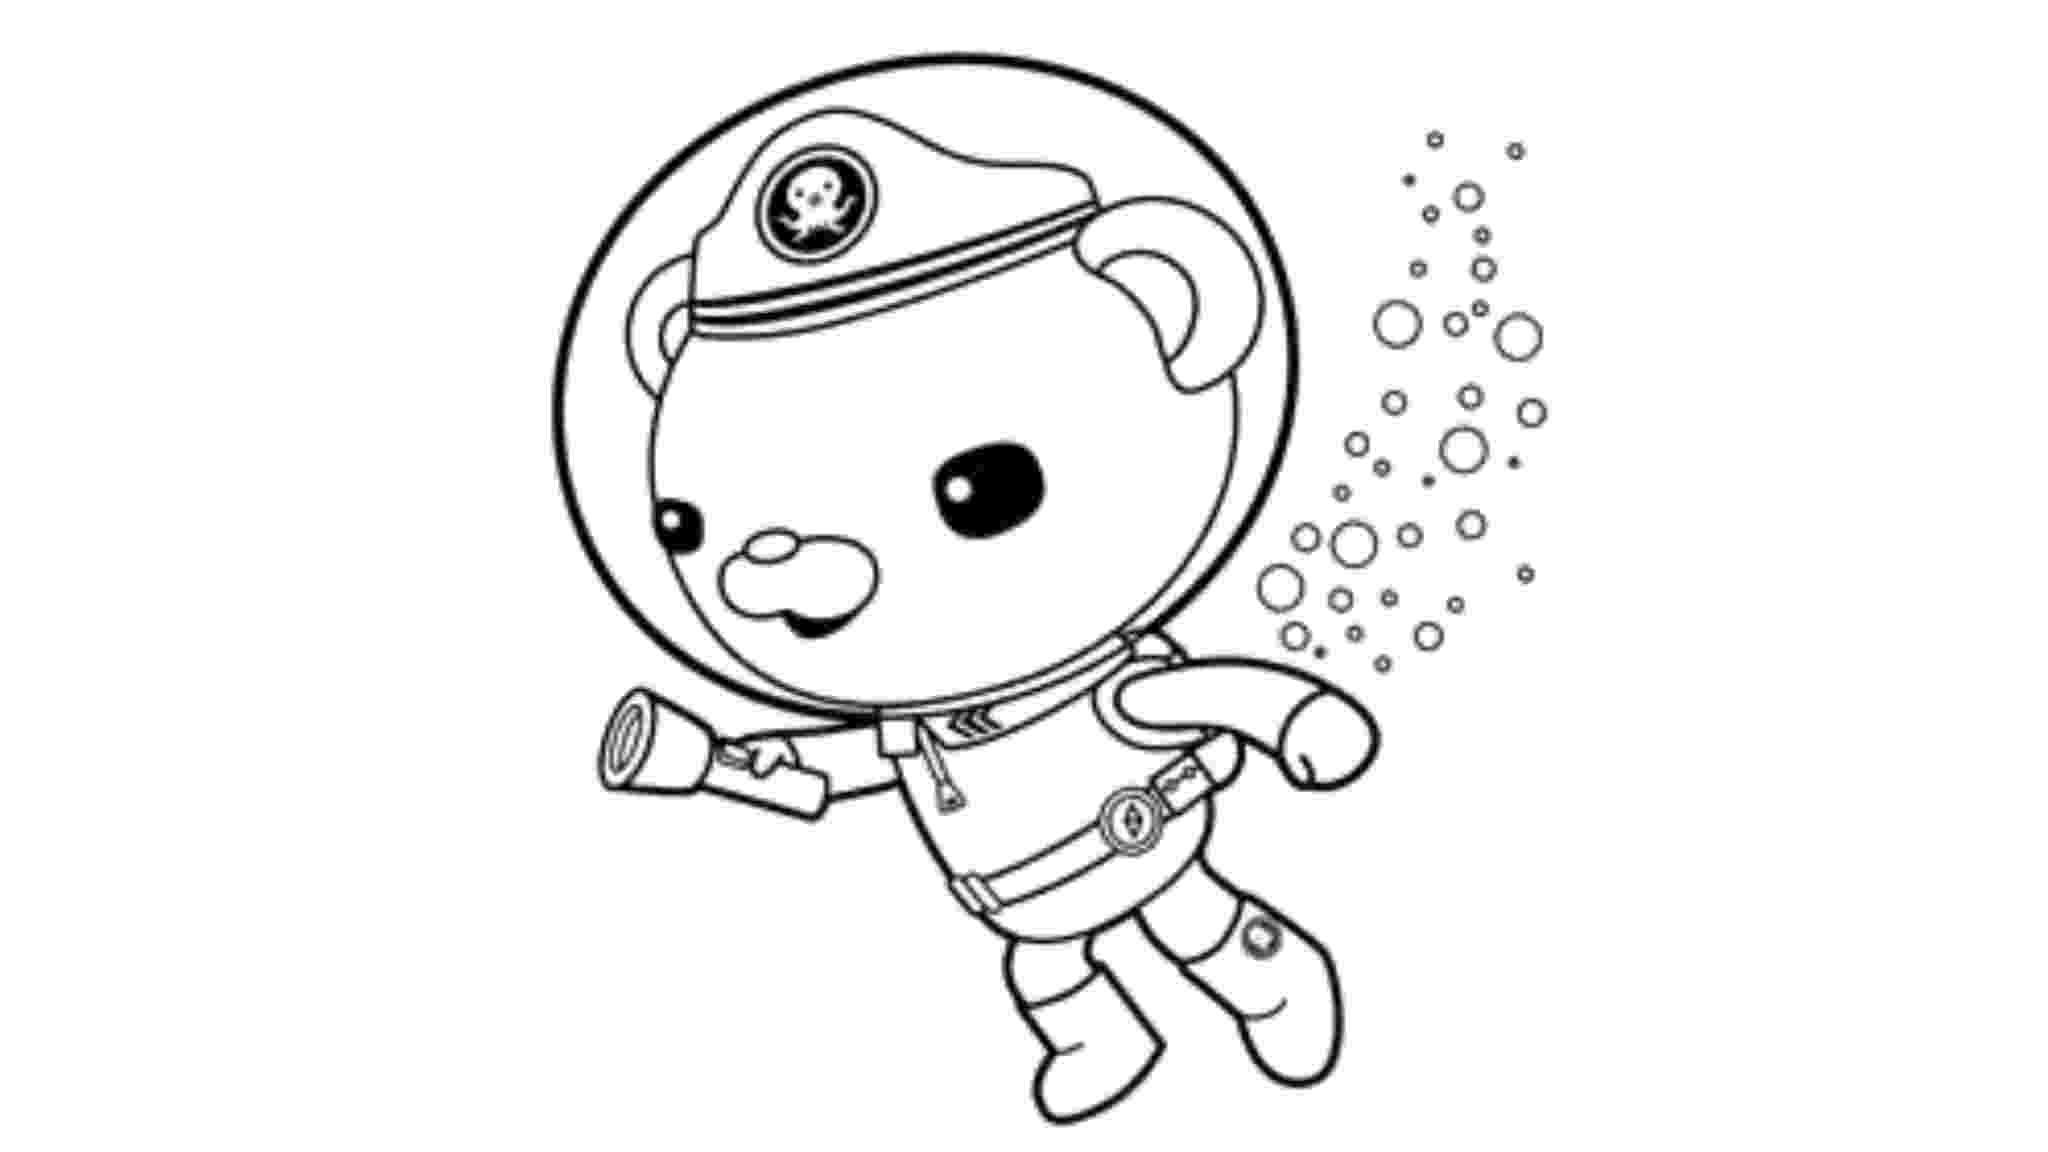 octonauts coloring print download octonauts coloring pages for your kids octonauts coloring 1 1